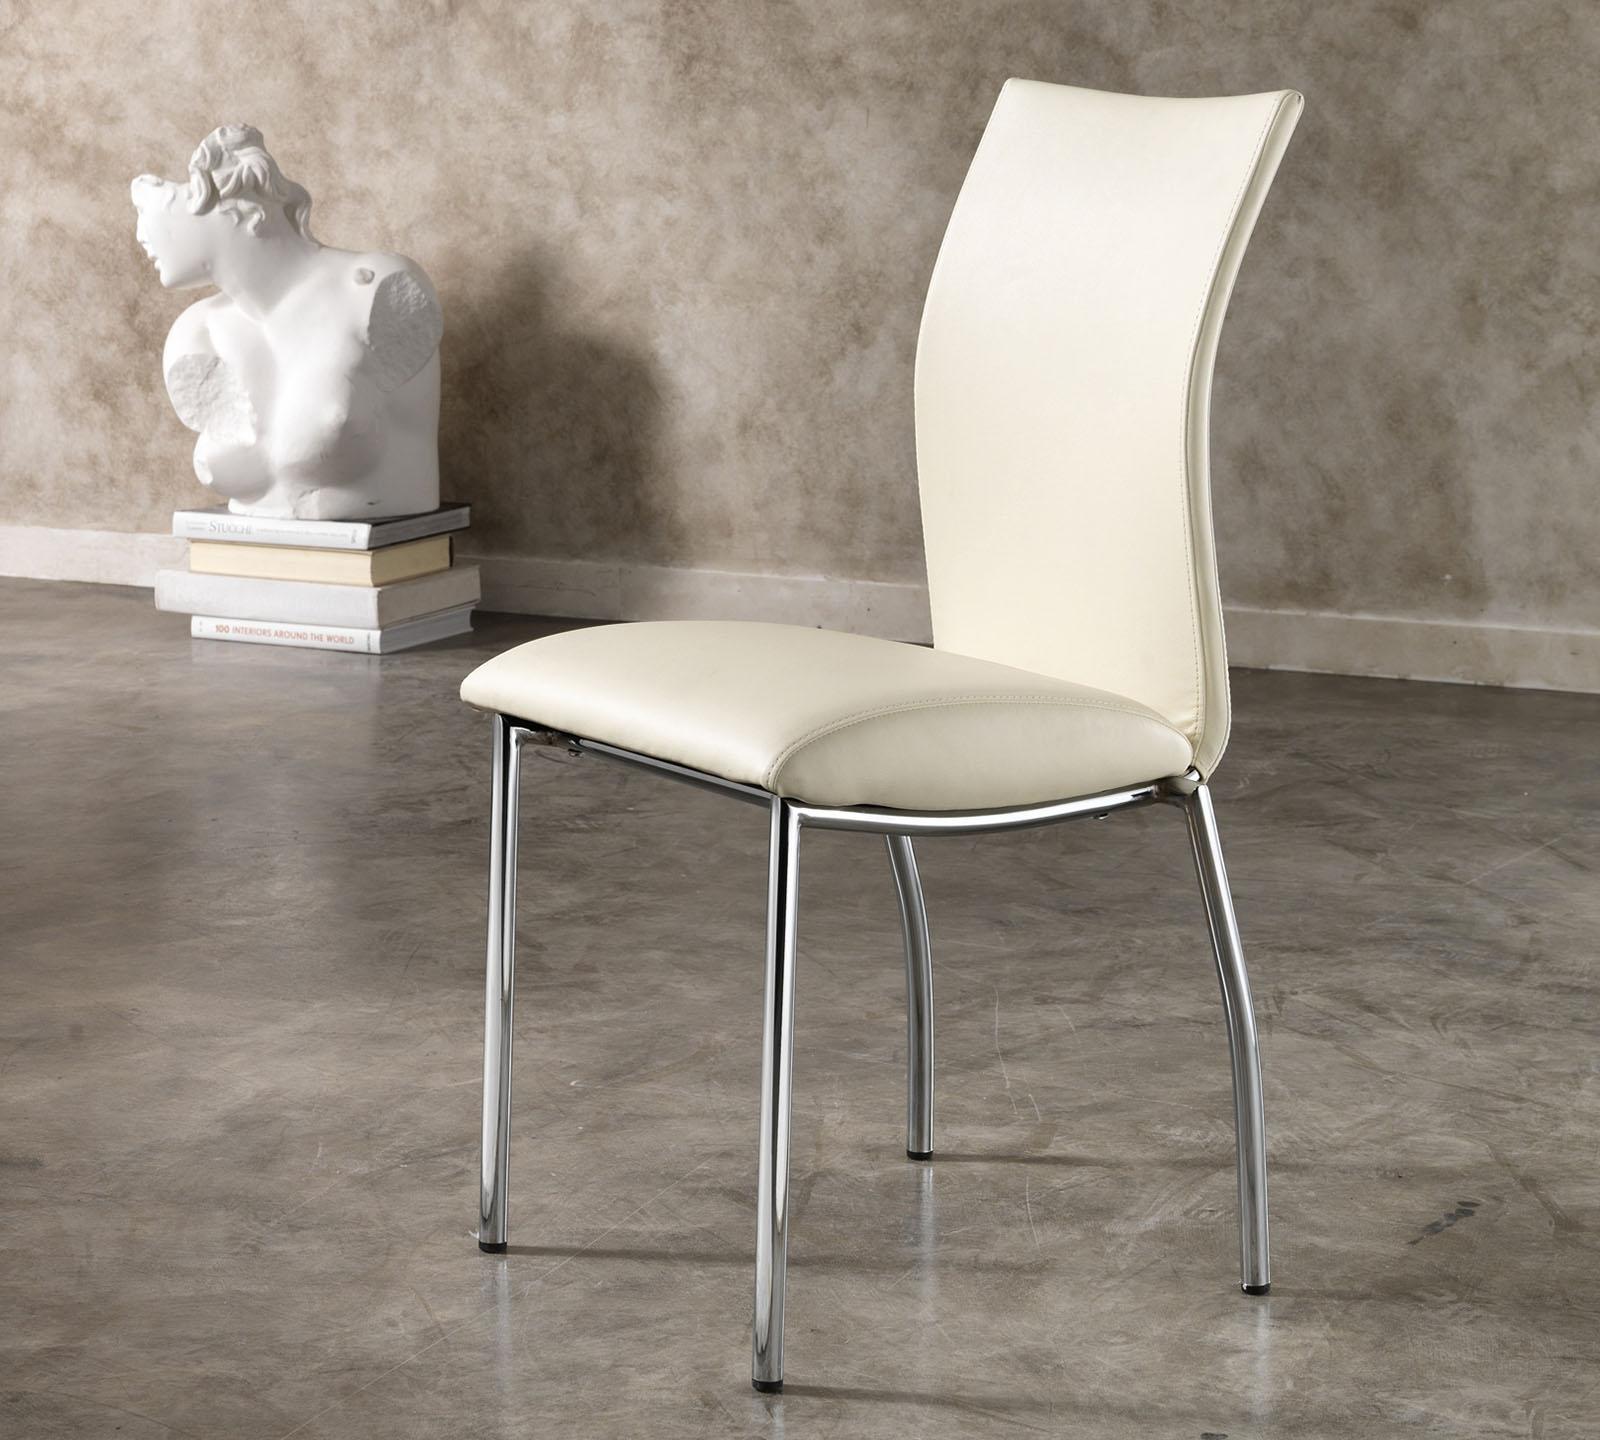 Sedia in ecopelle Adele bianca OM/208/BI | Duzzle